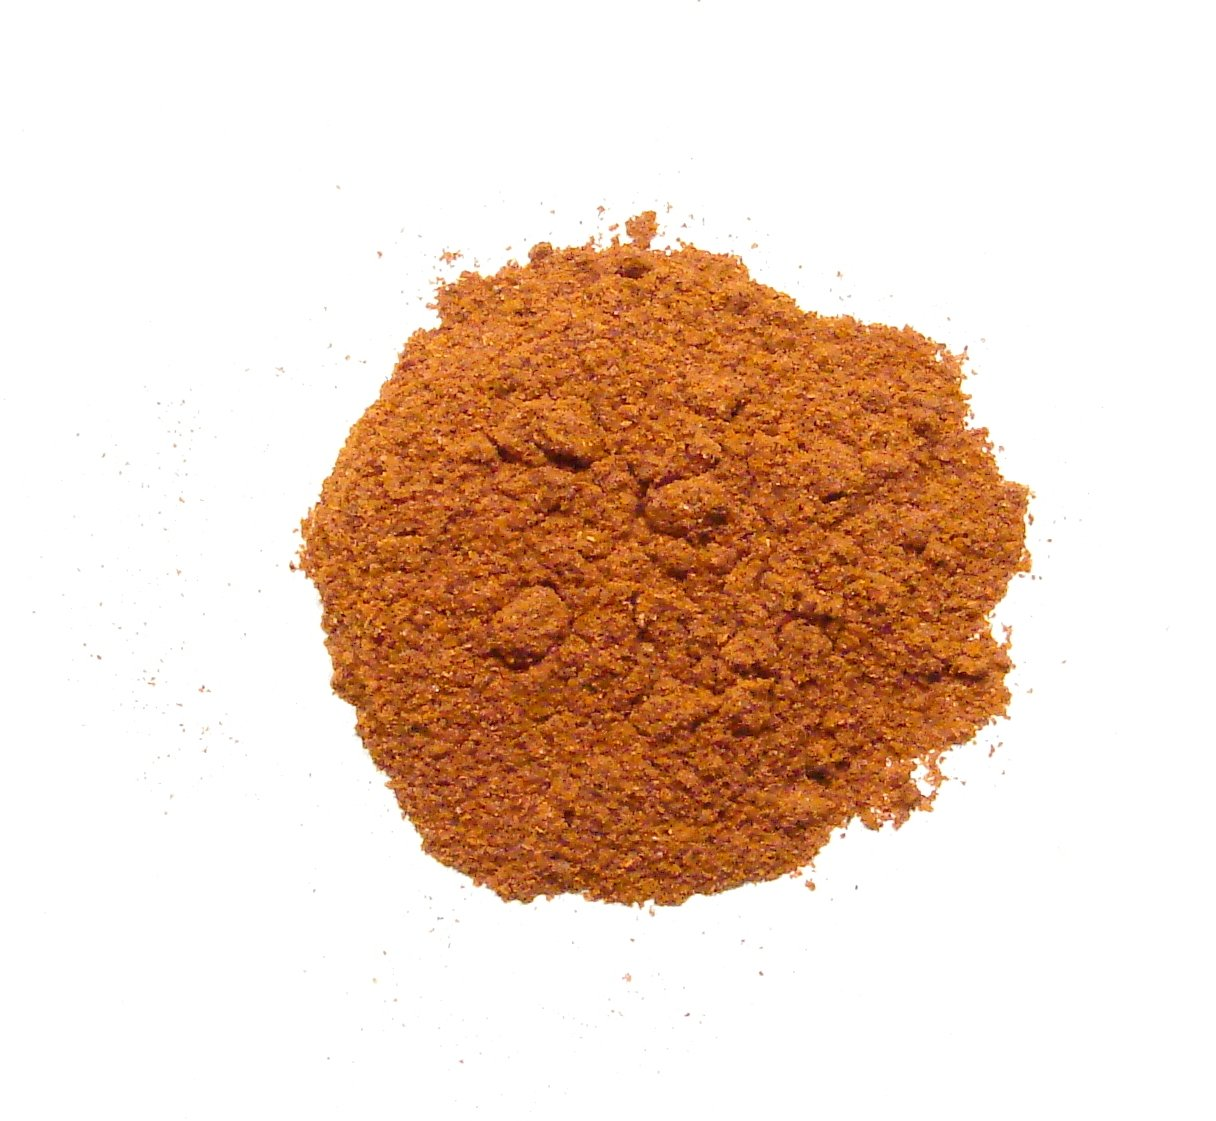 Habanero Chili Powder - 1 Pound (16 Ounces) - Ground Dried Hot Habanero Peppers